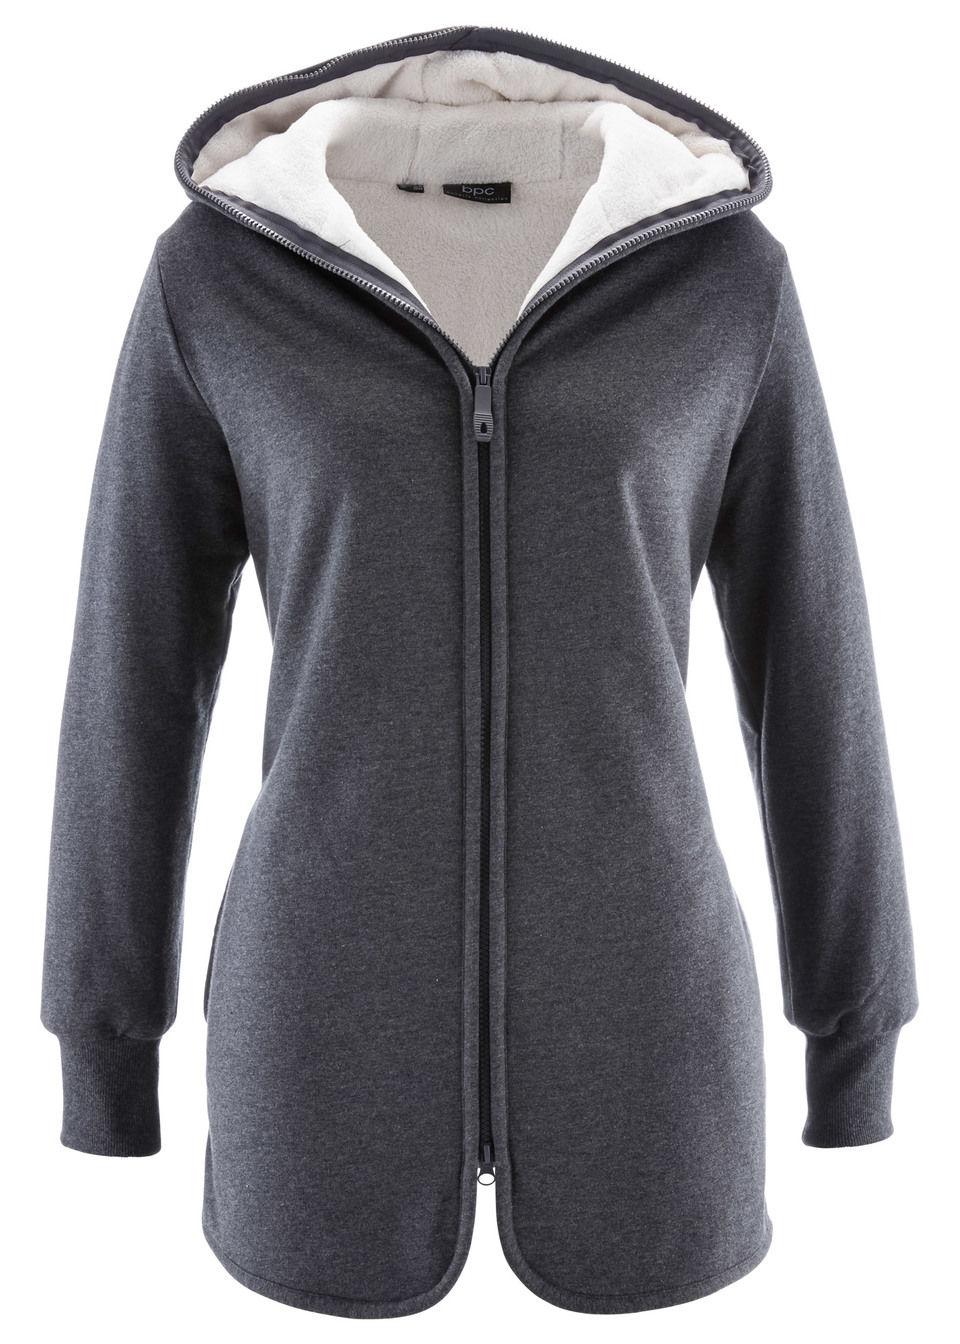 Jachetă fleece bonprix